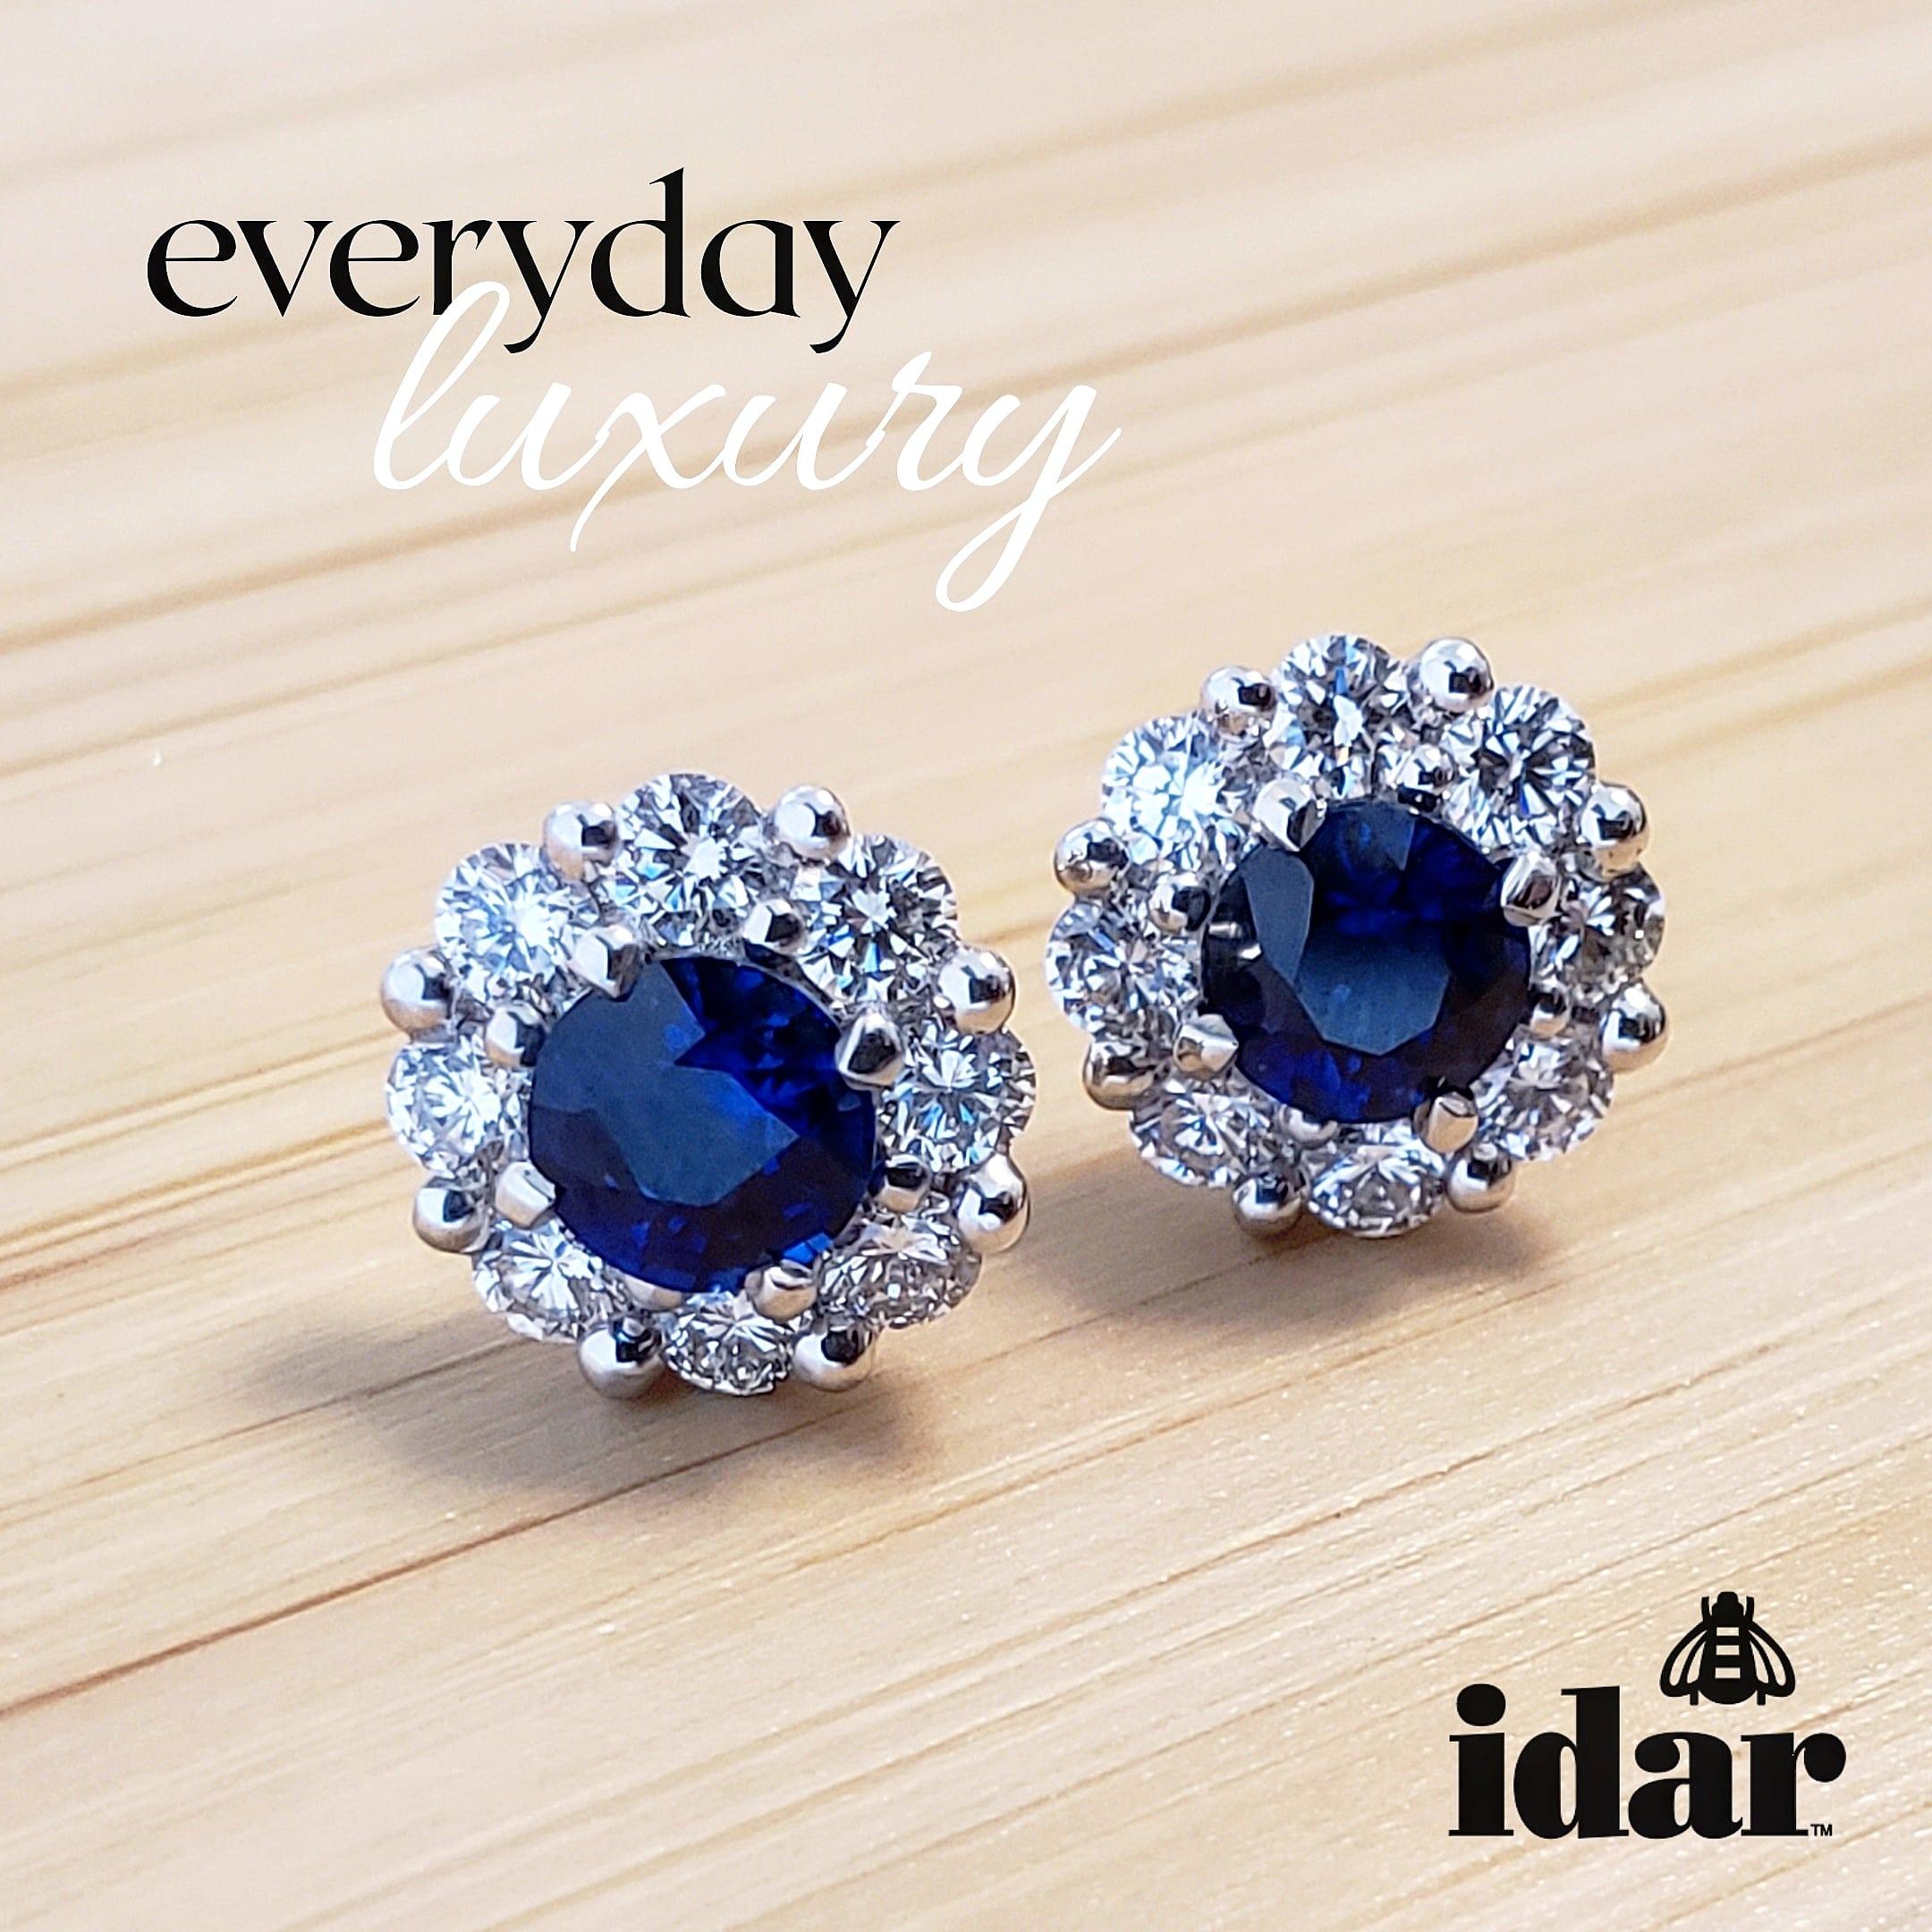 Idar Jewellers, diamonds, gold handcrafted jewellery, everyday luxury, Victoria, BC, Vancouver, Calgary, Edmonton, Ottawa, Toronto, Montreal, Canada